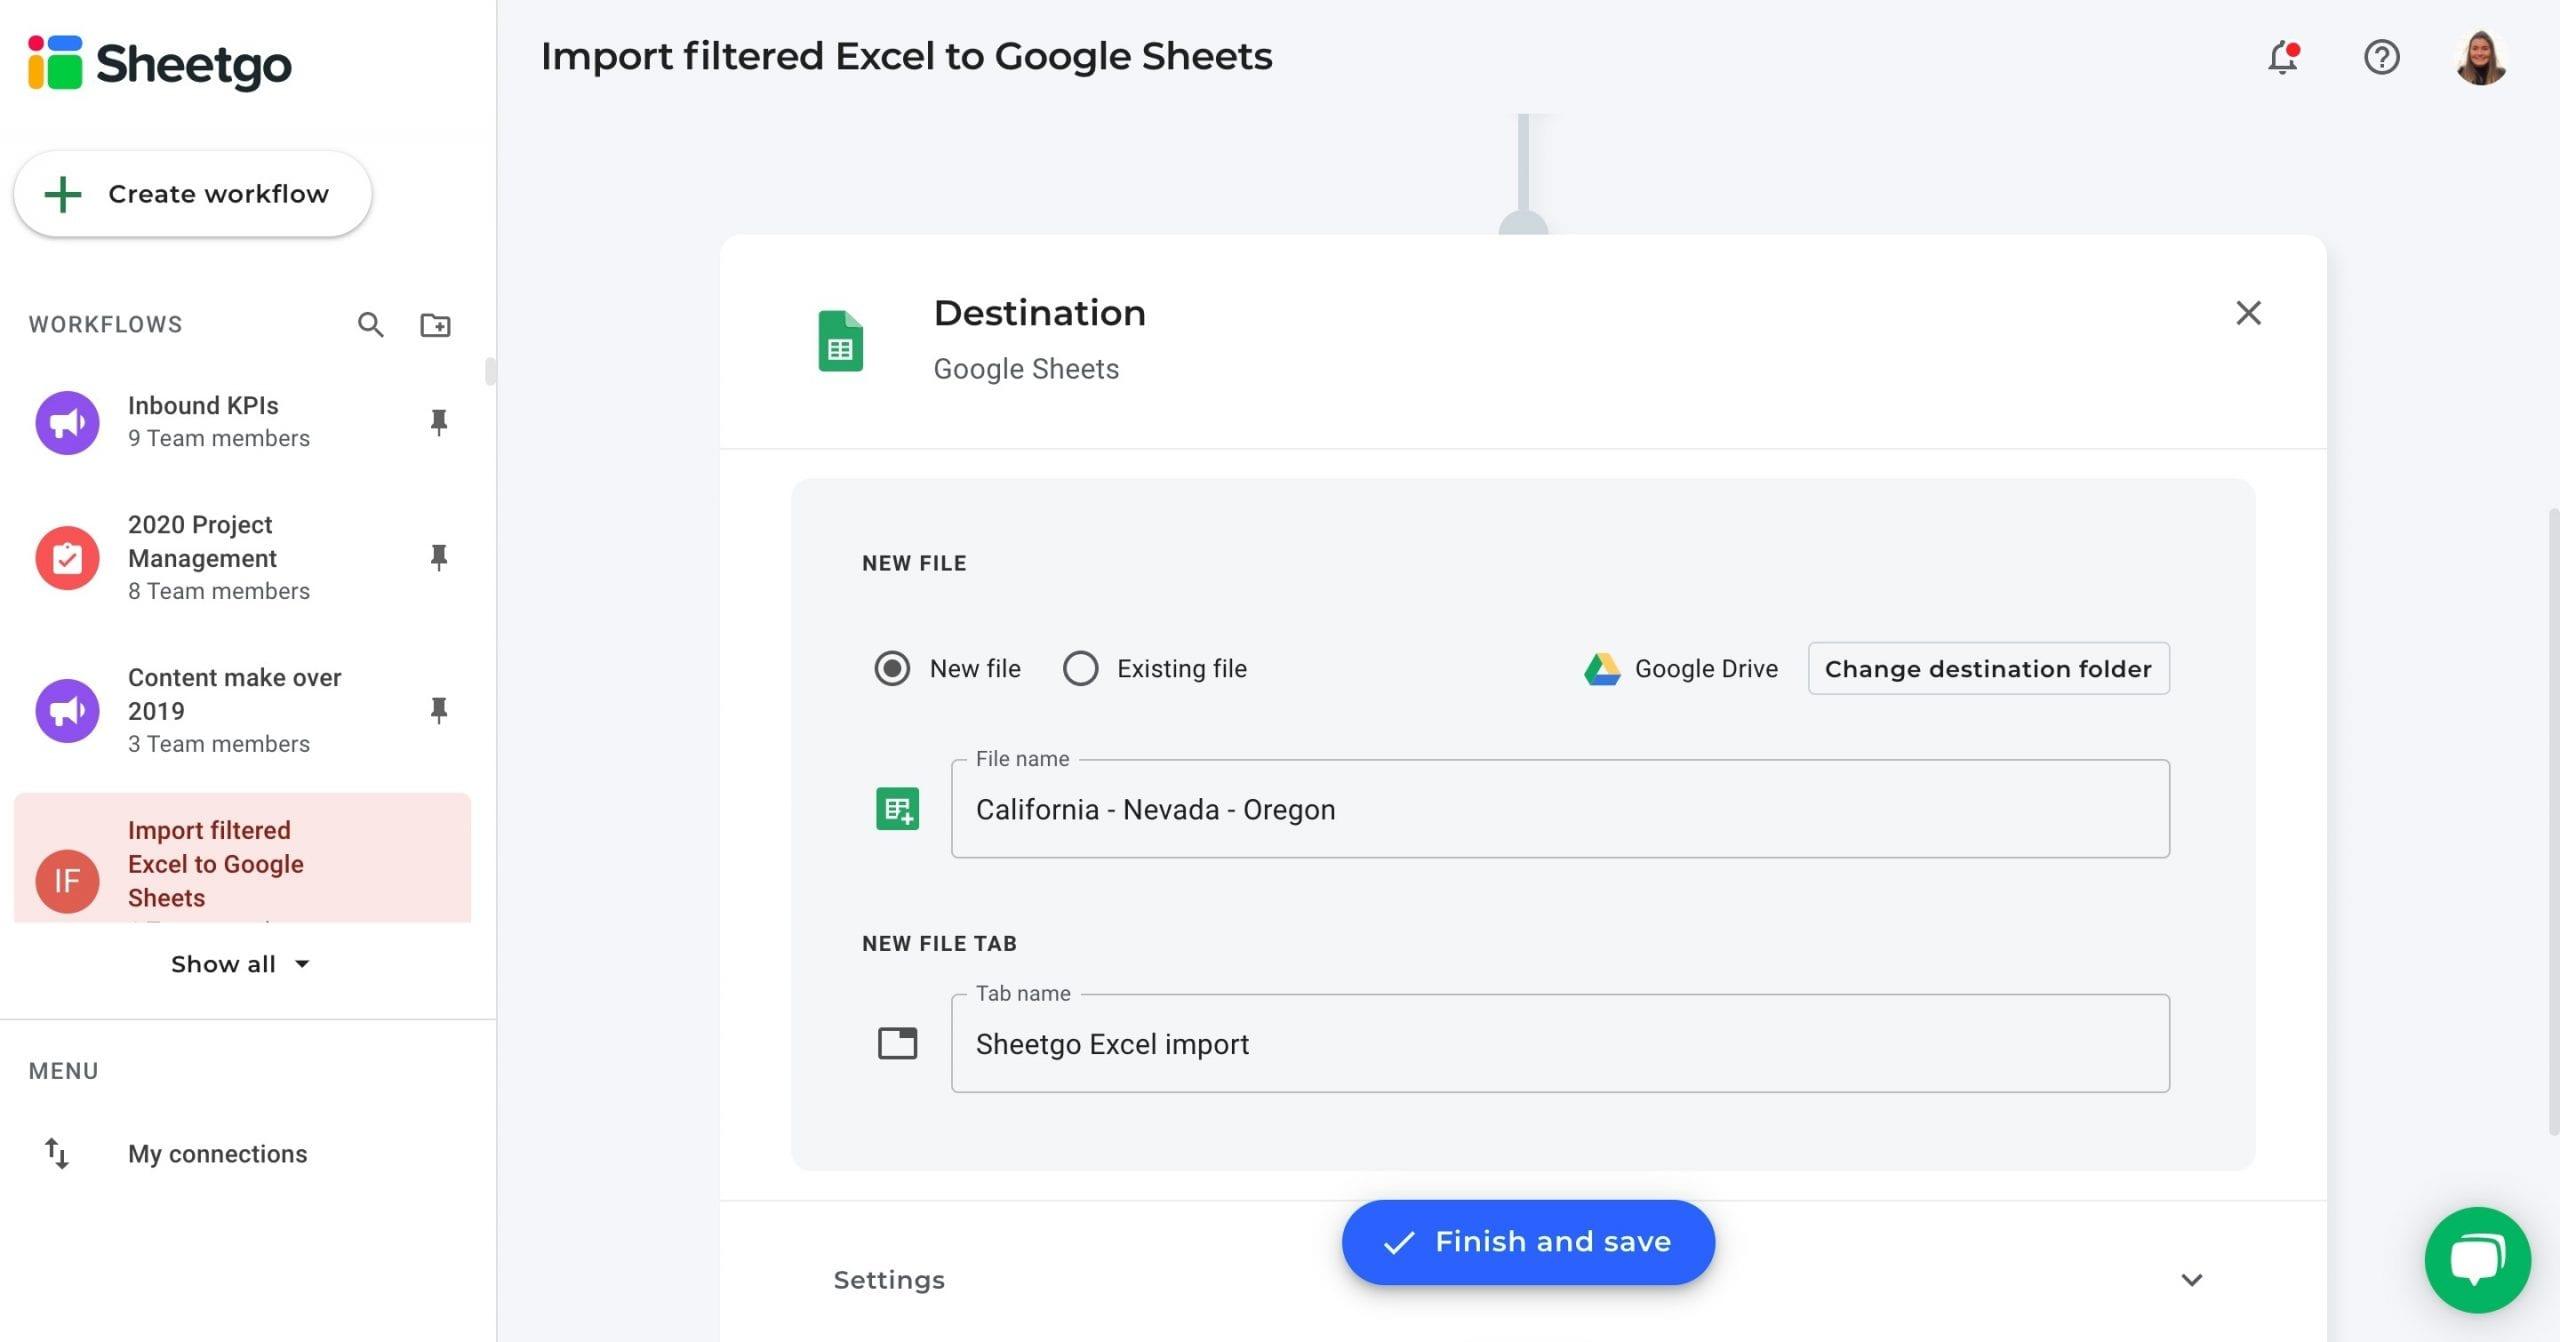 Import filtered Excel to Google Sheets - data destination